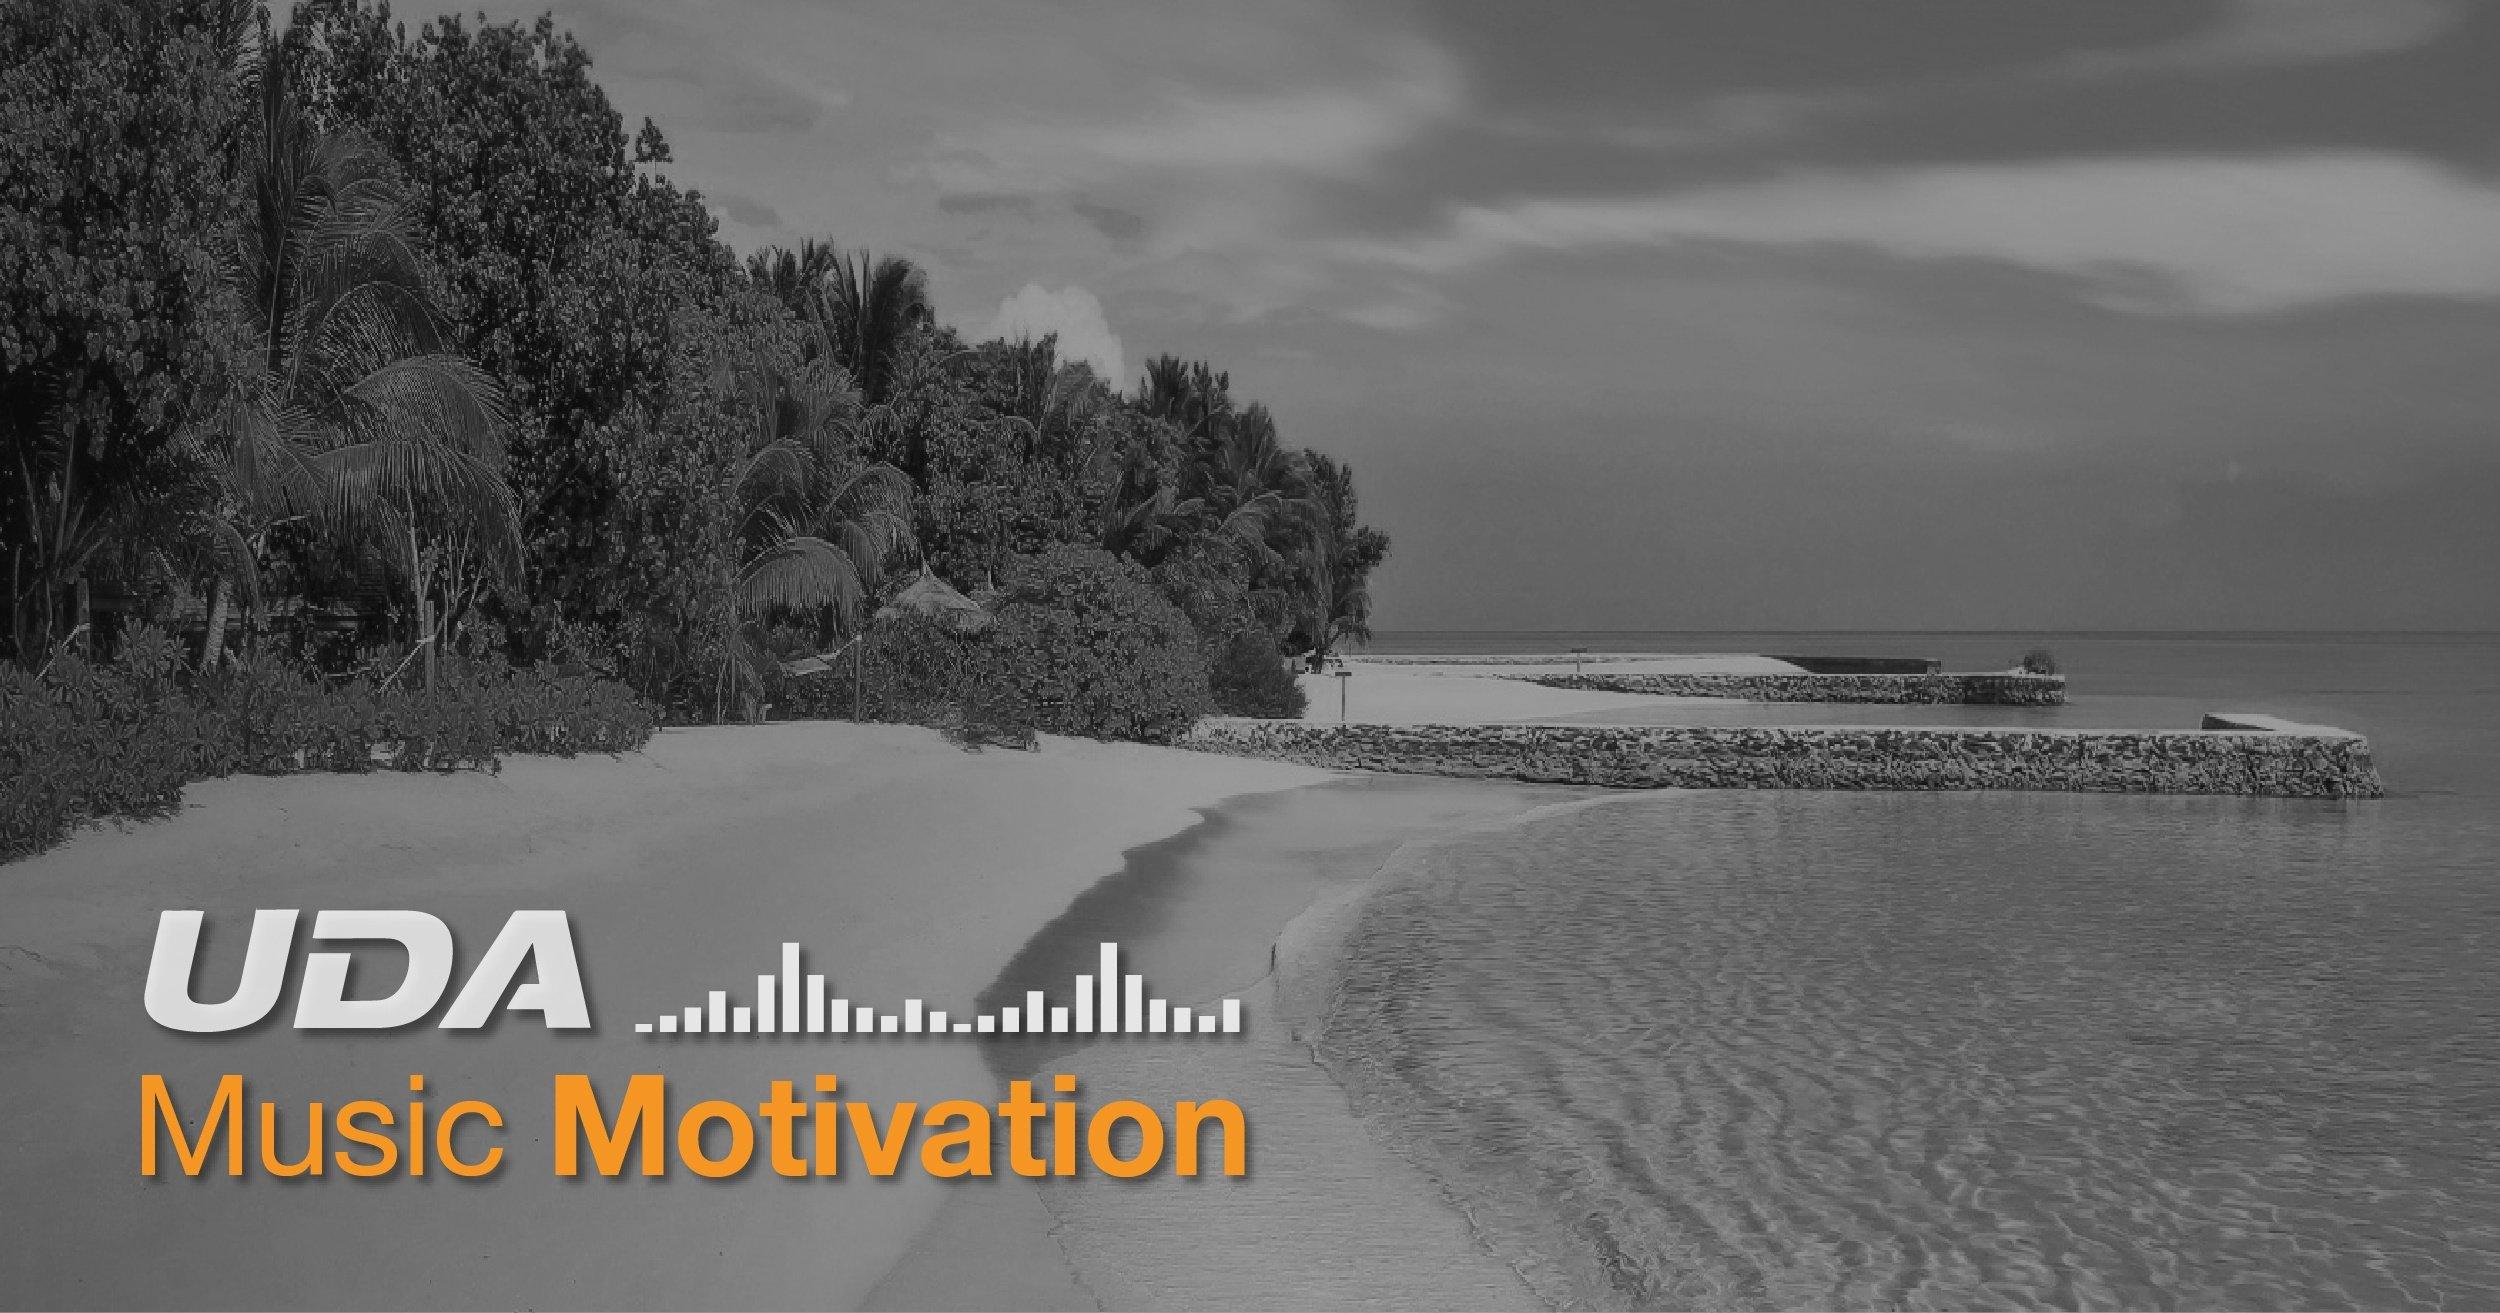 Music Motivation: Vacation Vibes